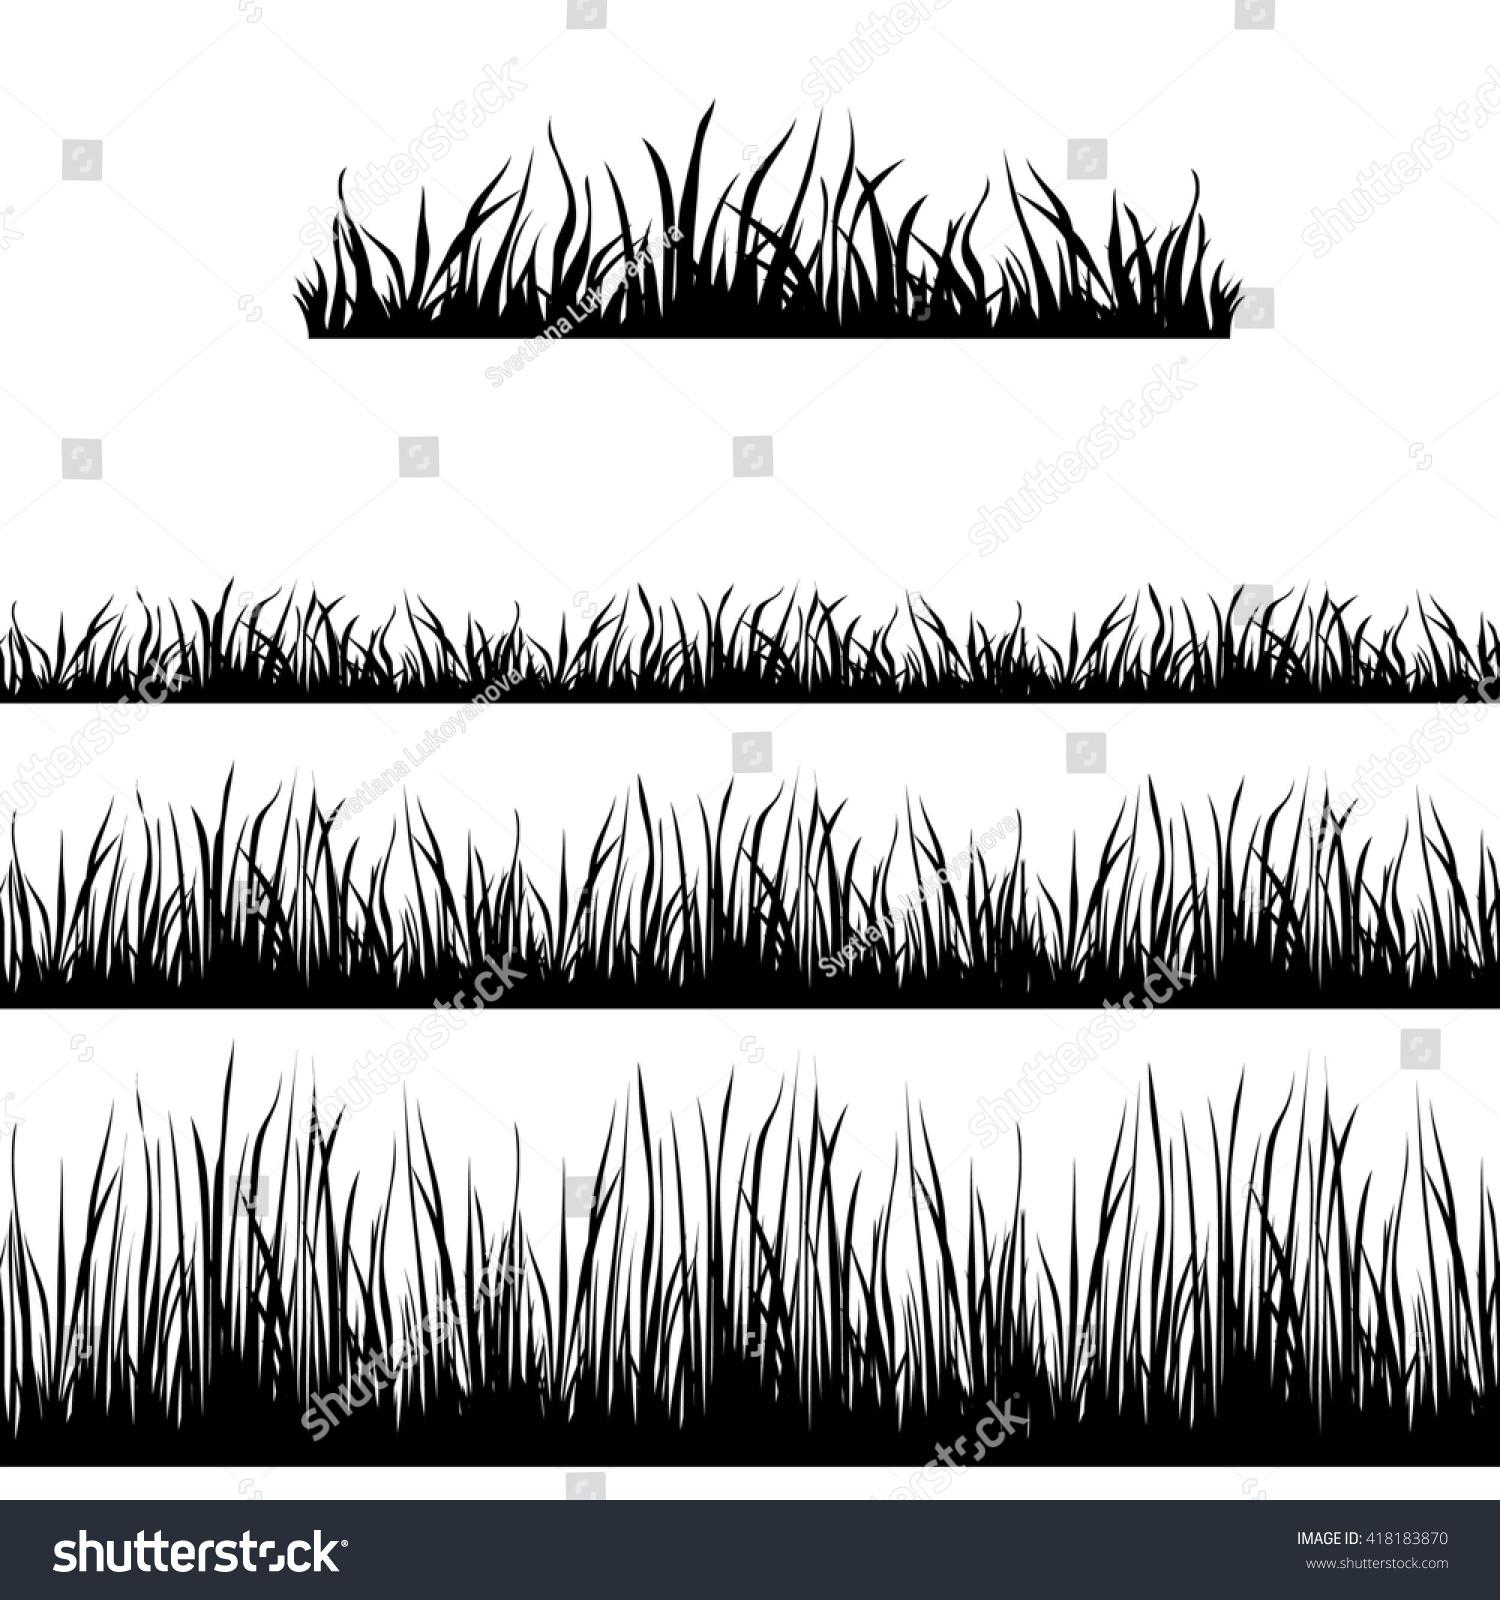 Seamless Grass Black Silhouette Vector Brushes Stock Vector ...